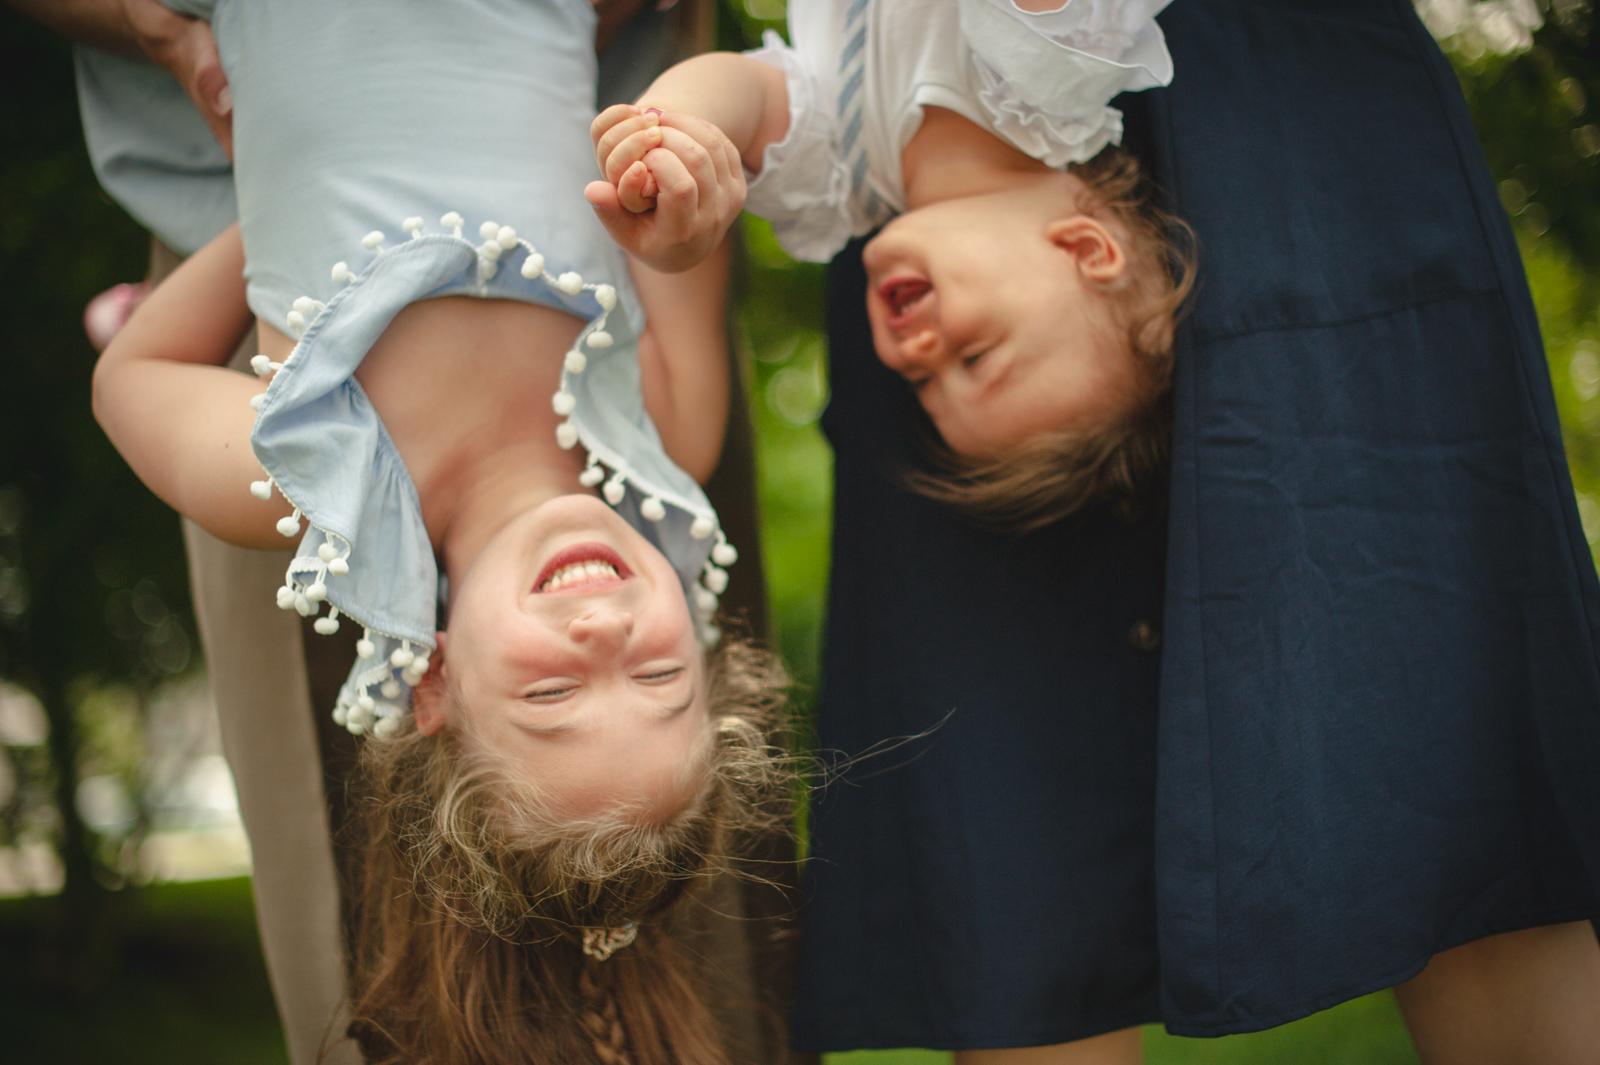 Sisters hanging upside down giggle.